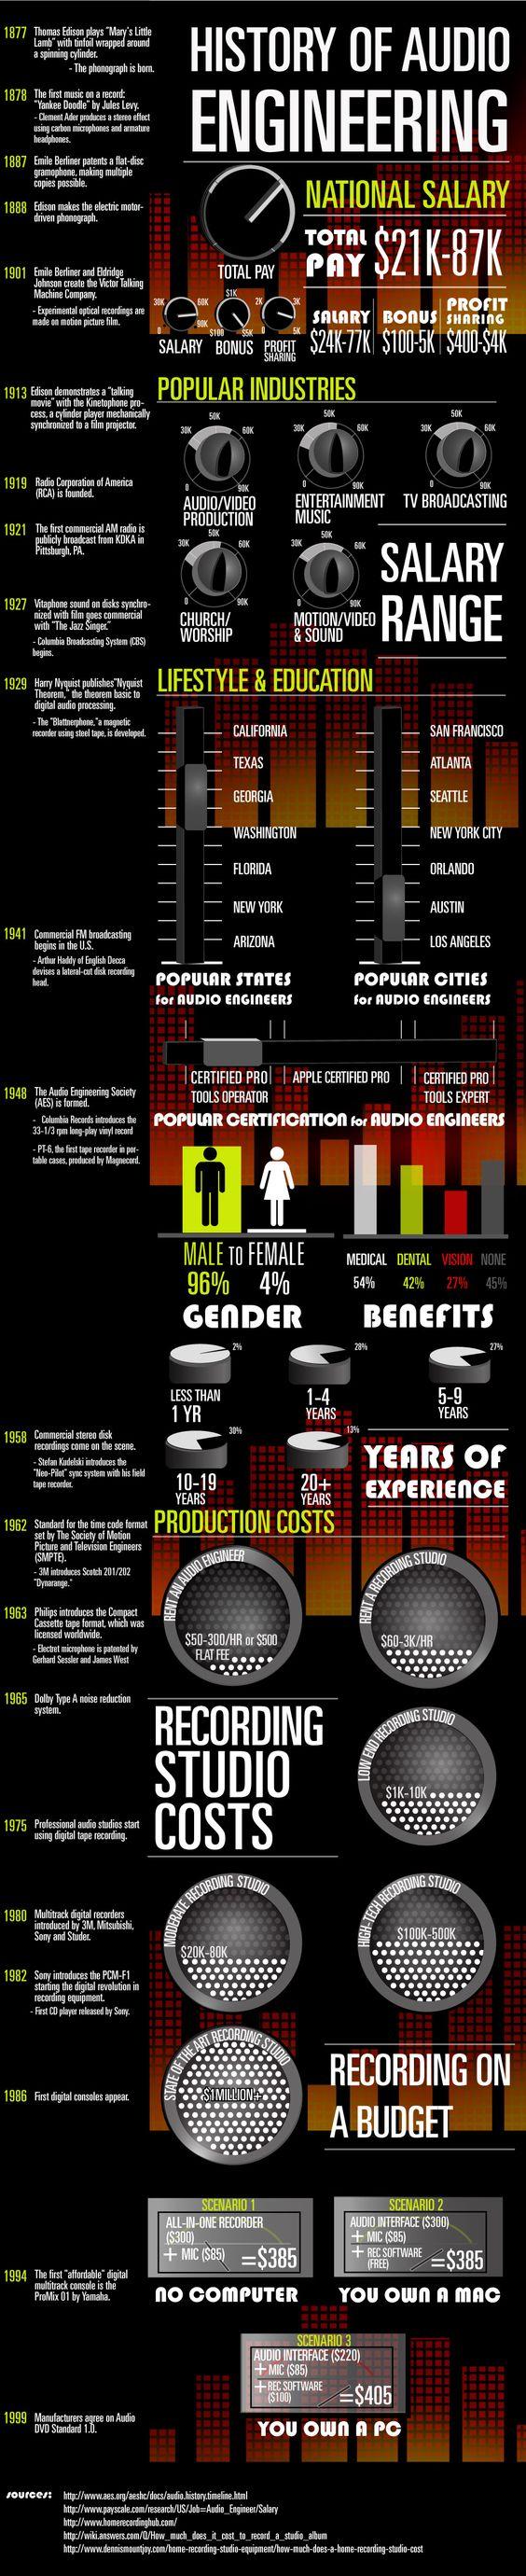 History of Audio Engineering + Salary